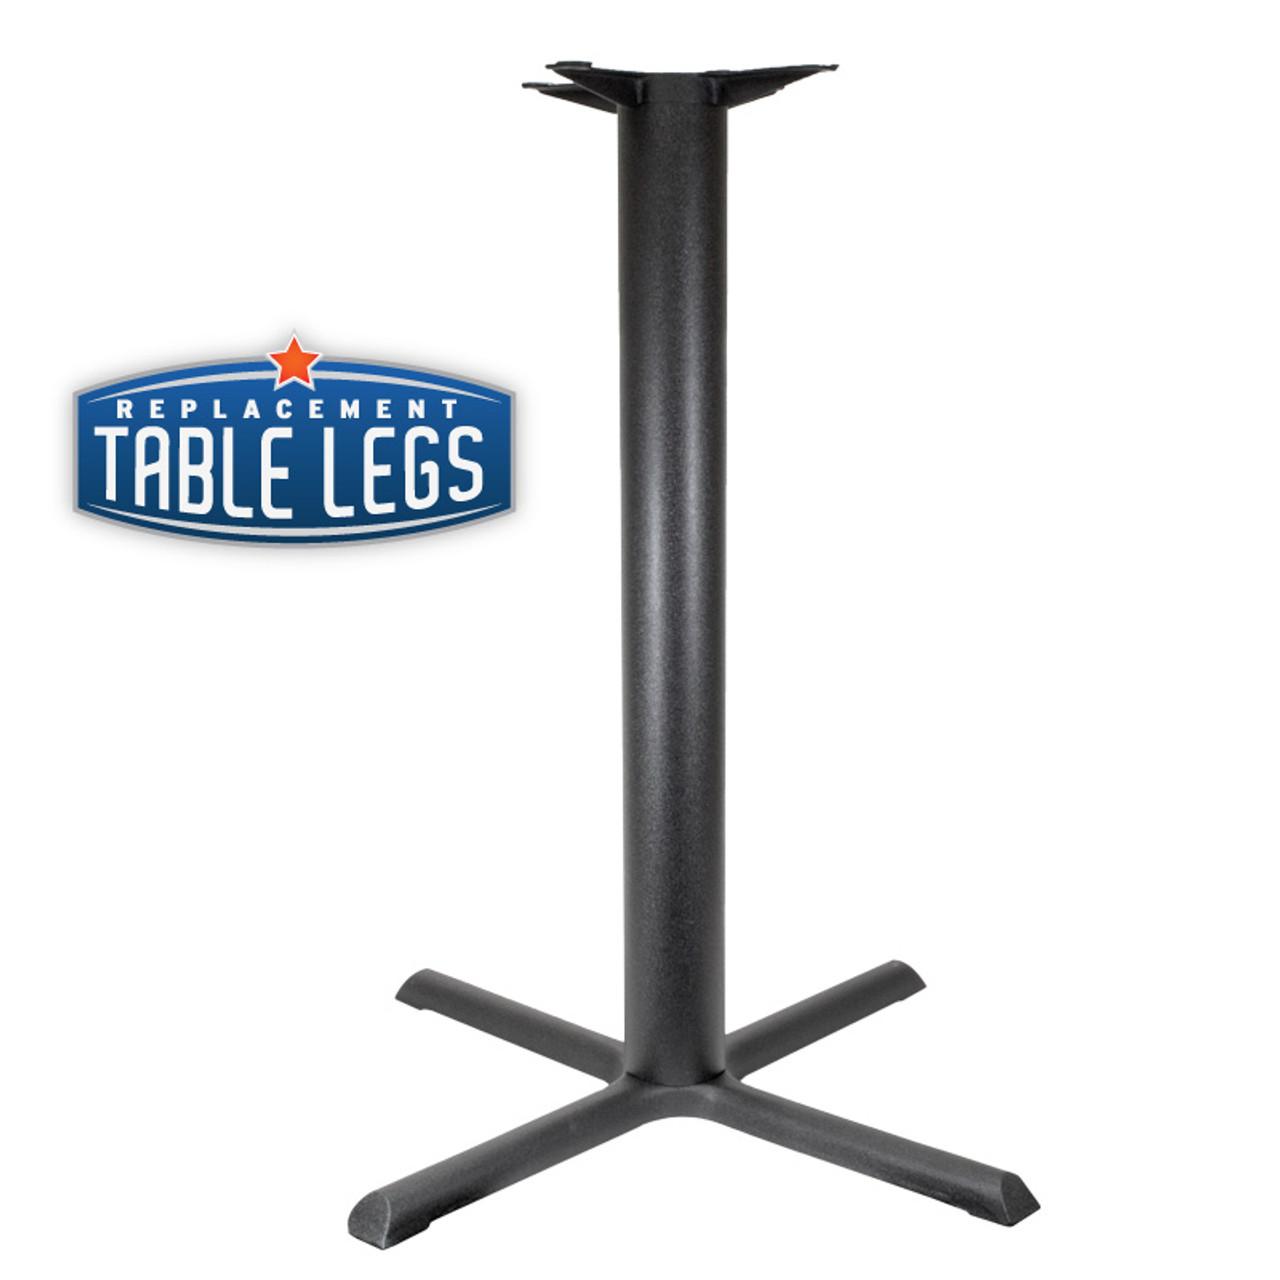 "CAST IRON TABLE BASE, X Style 22""x22"", 40"" height, 3"" diameter steel column - replacementtablelegs.com"